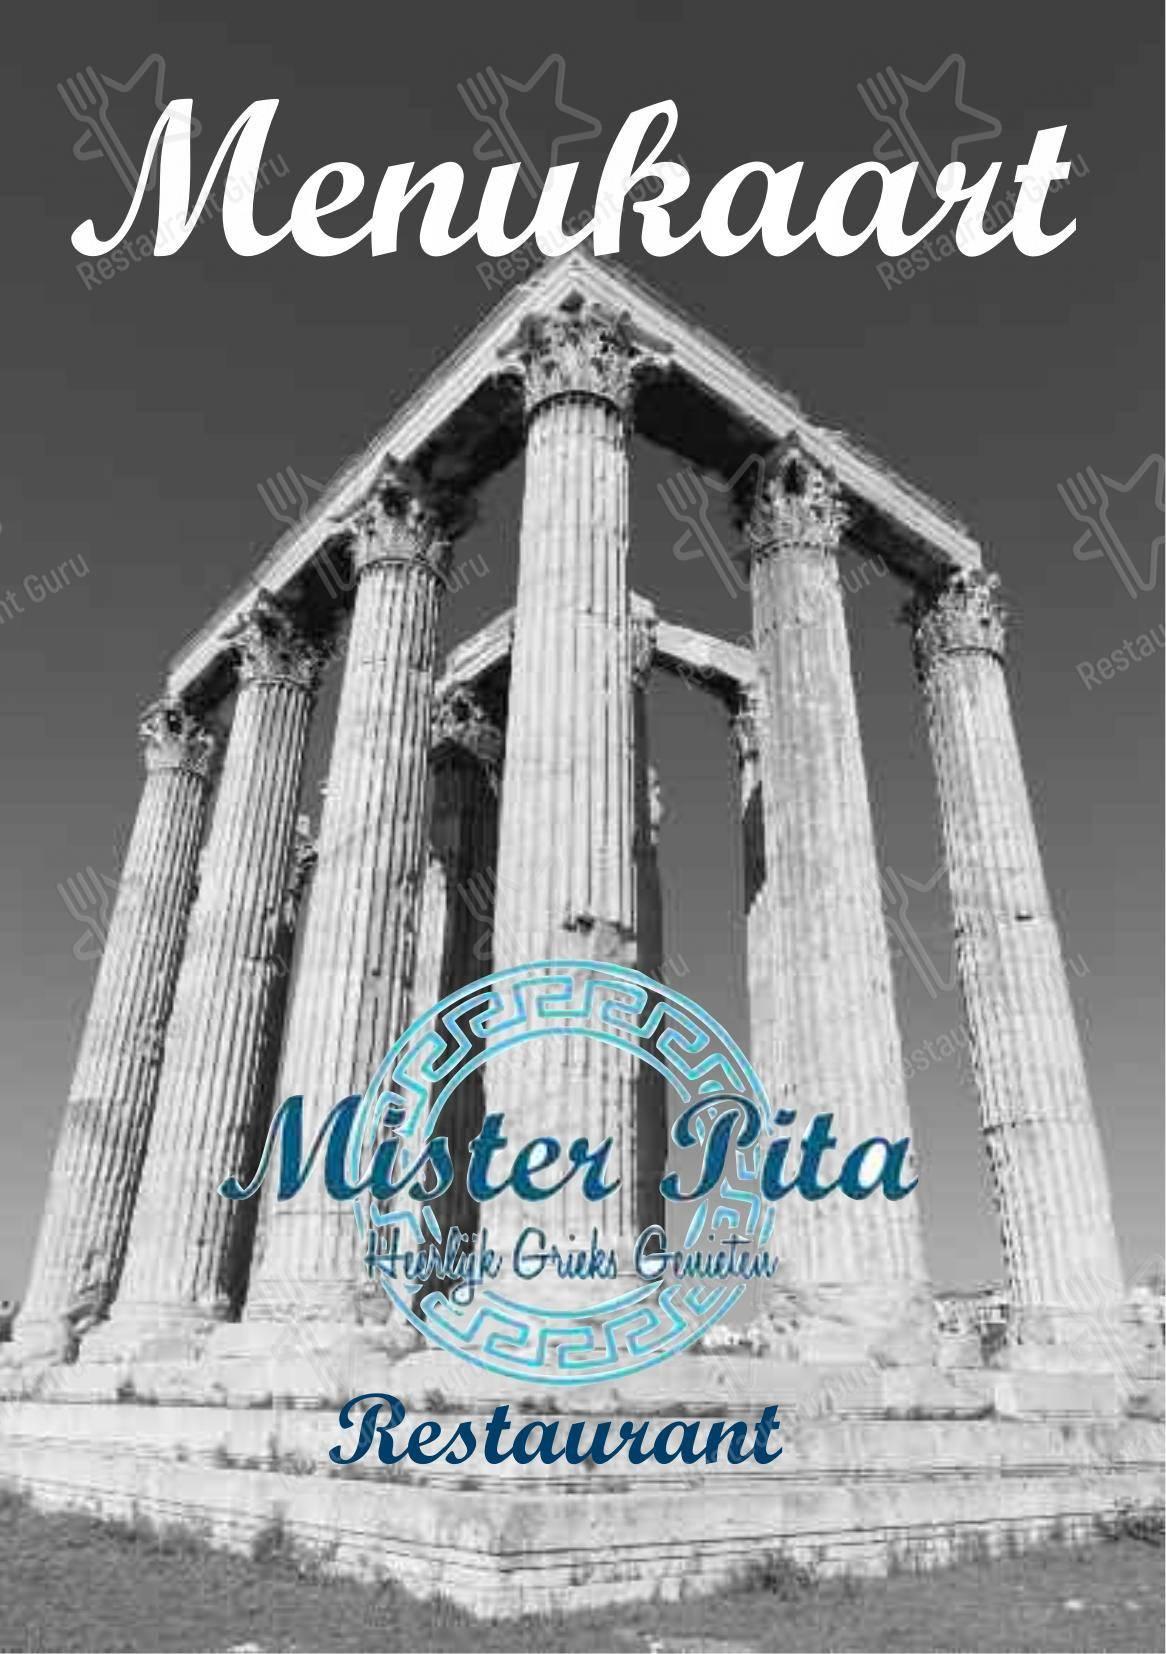 Menu for the Mister Pita restaurant